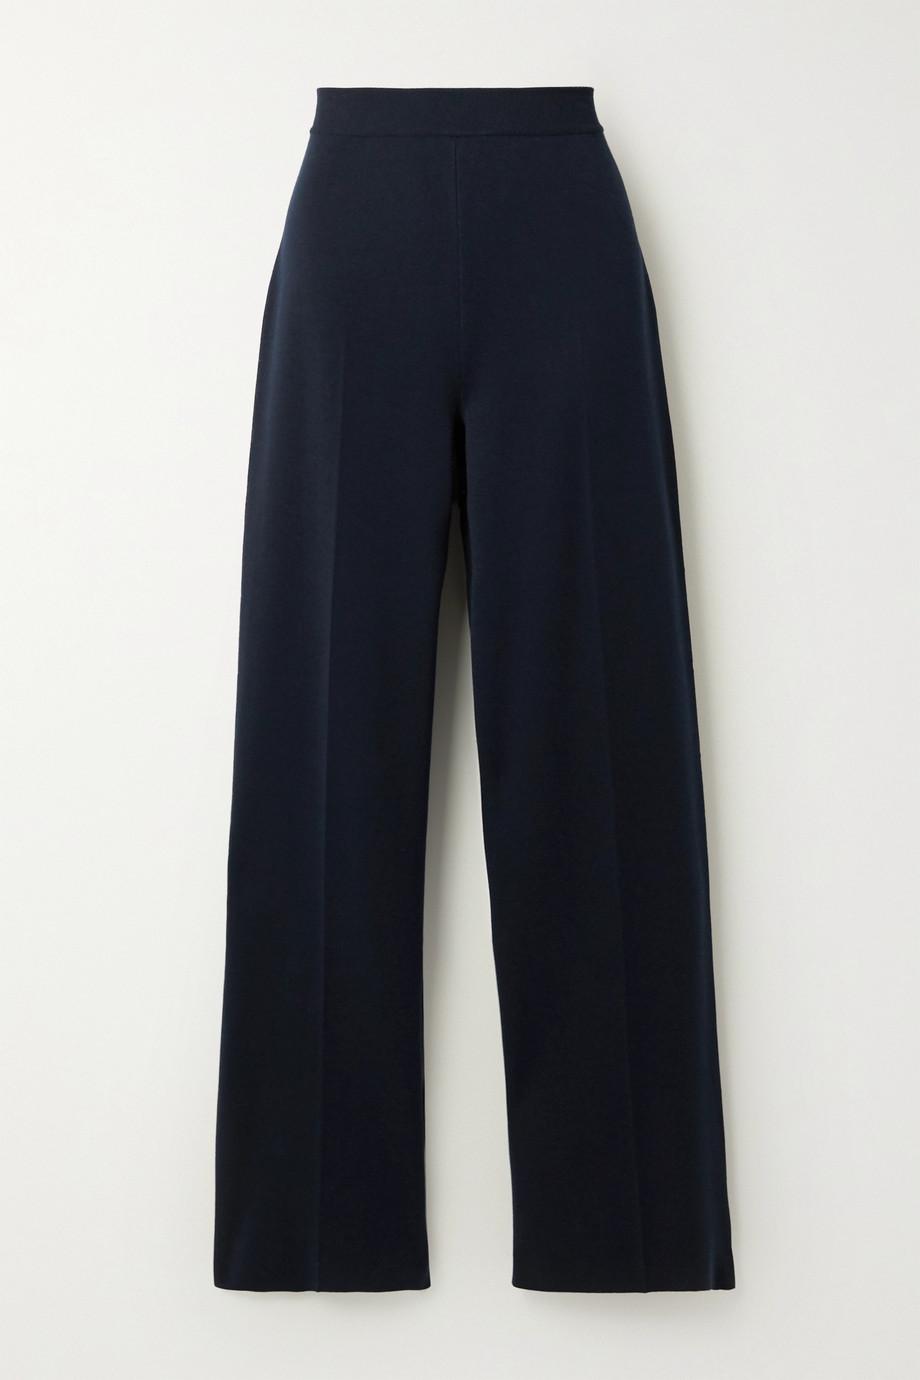 Loro Piana Silk and cotton-blend wide-leg pants